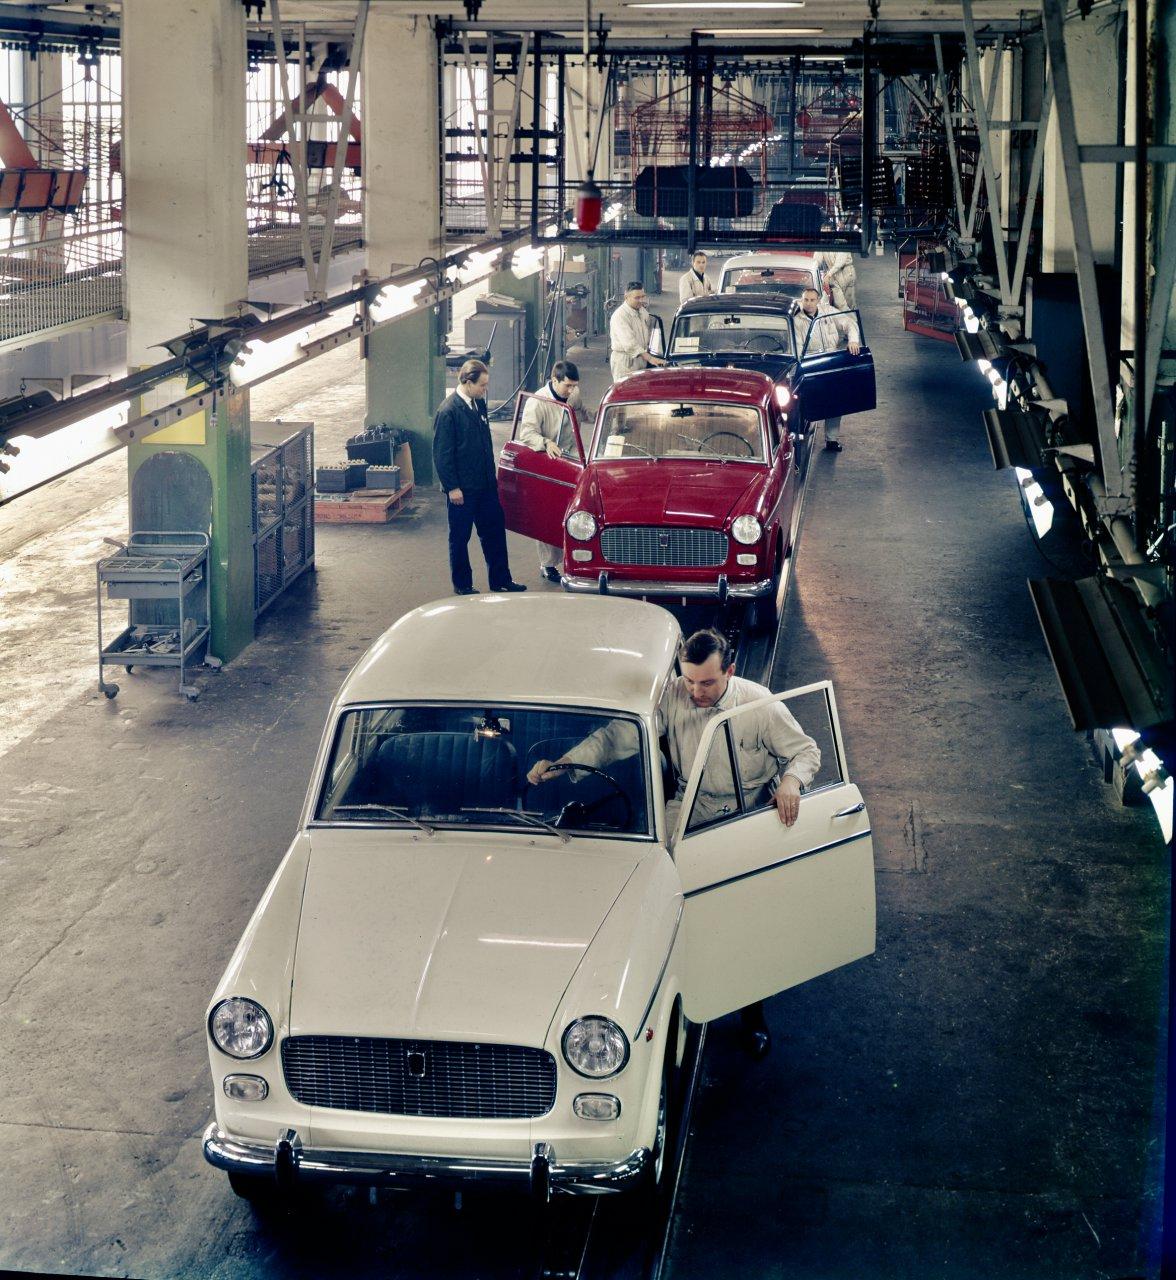 museum, Rooftop experience: Exhibit celebrates Lingotto's history, ClassicCars.com Journal